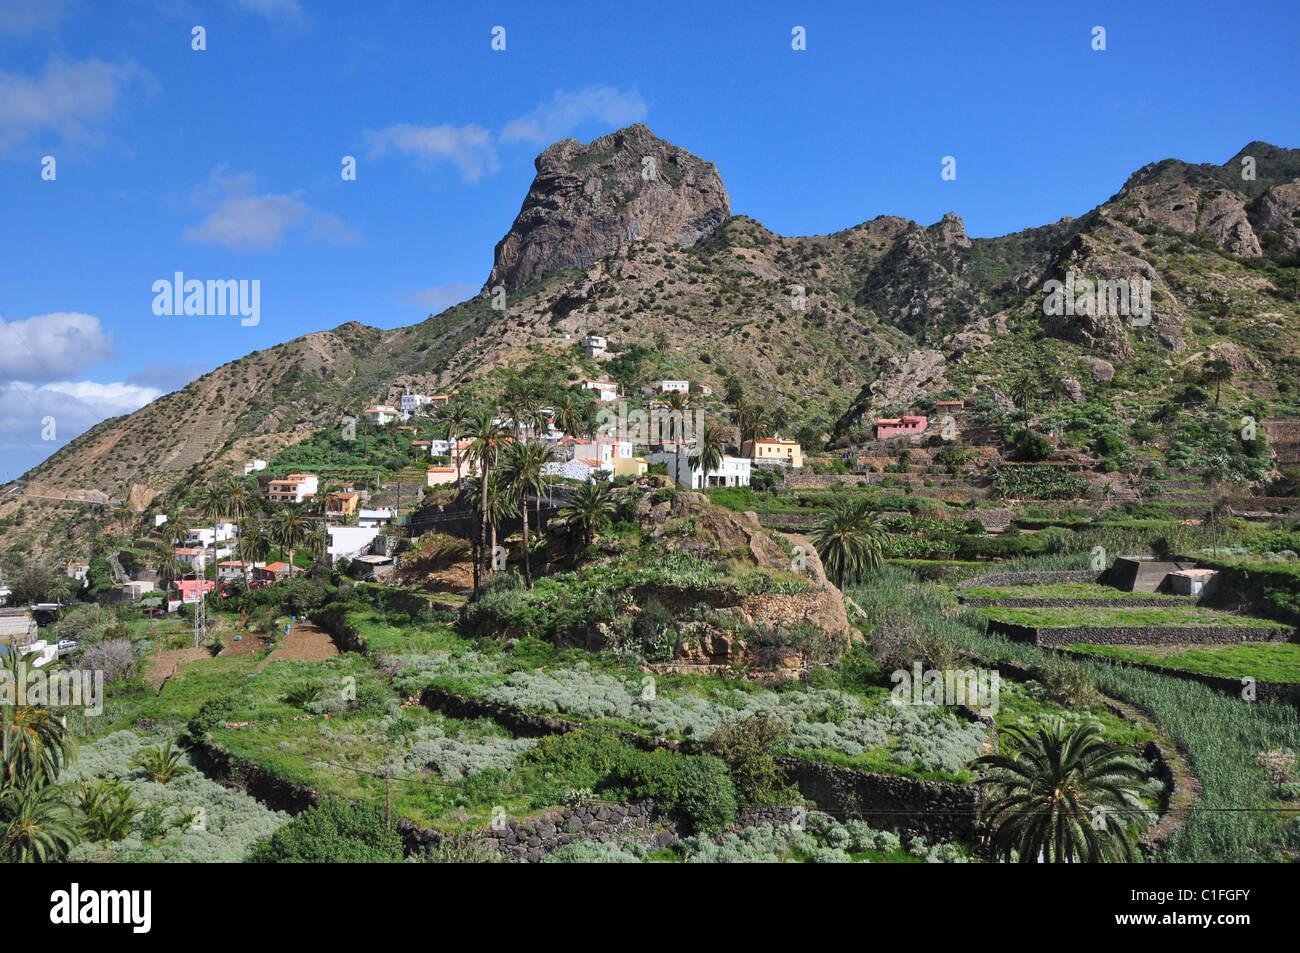 Vallehermoso, Roque Cano,  La Gomera, Canary Islands, Spain - Stock Image